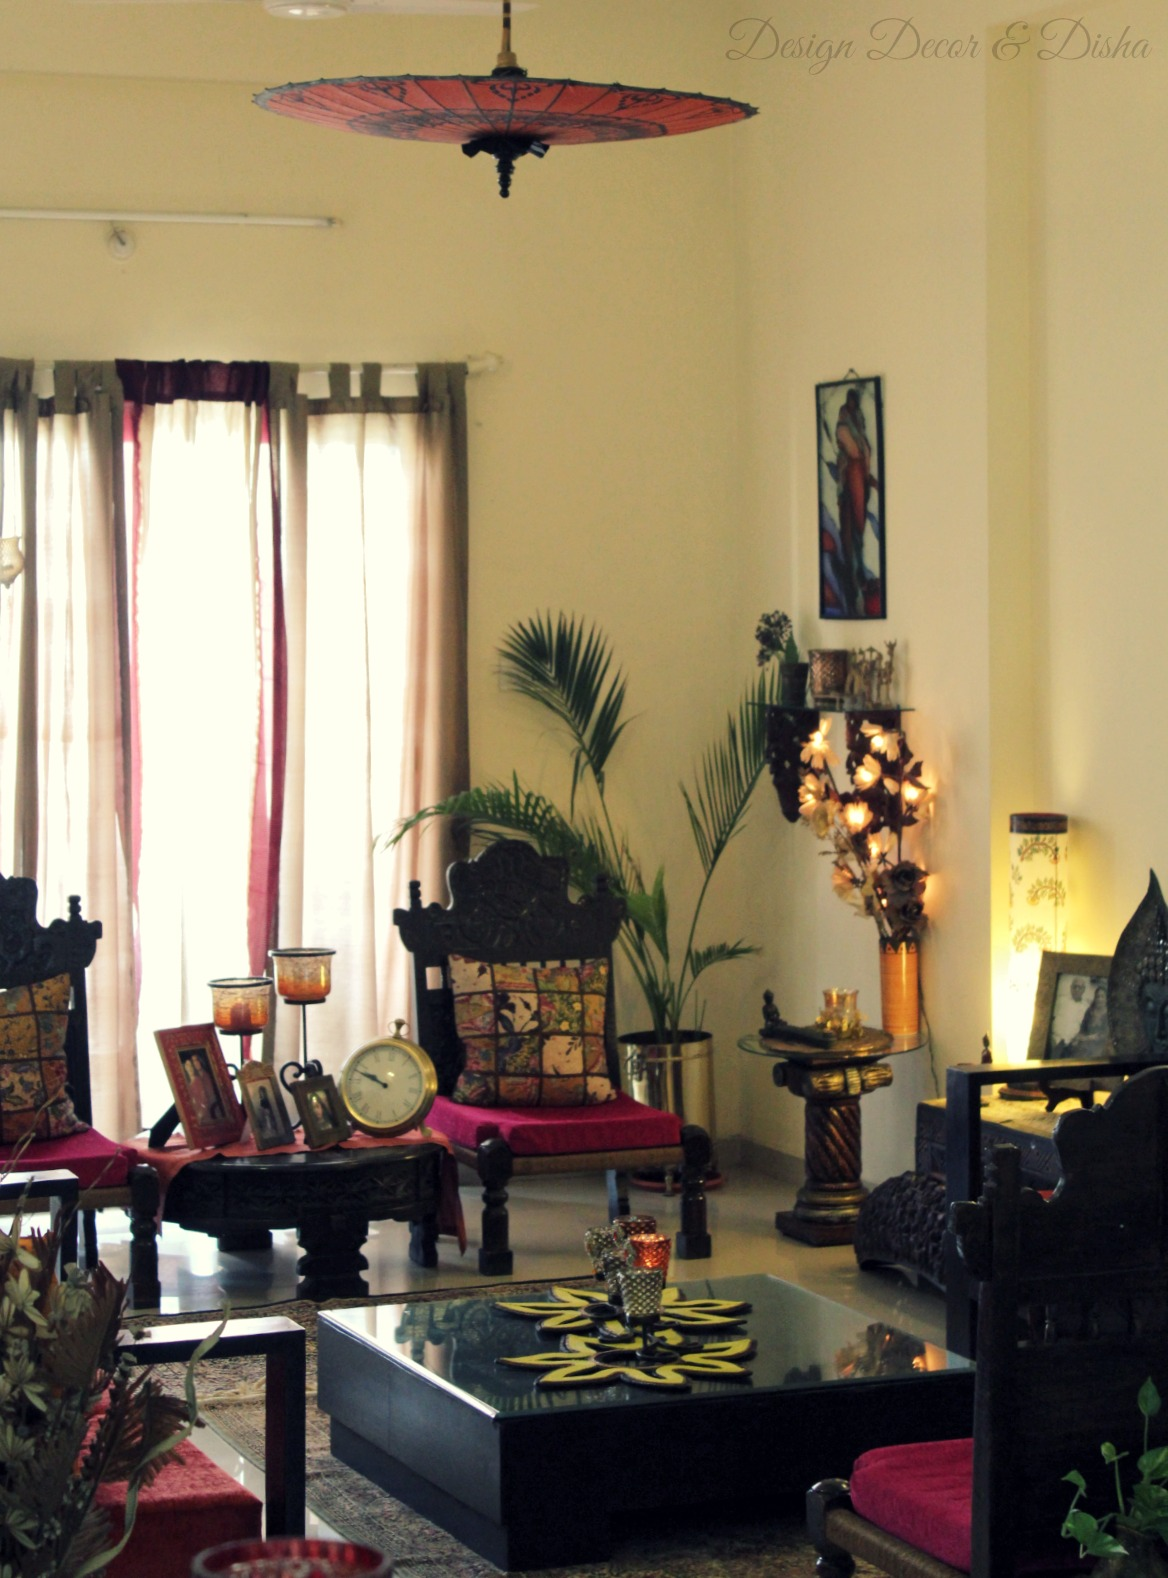 Design Decor  Disha  An Indian Design  Decor Blog Home Tour Kapila Banerjee